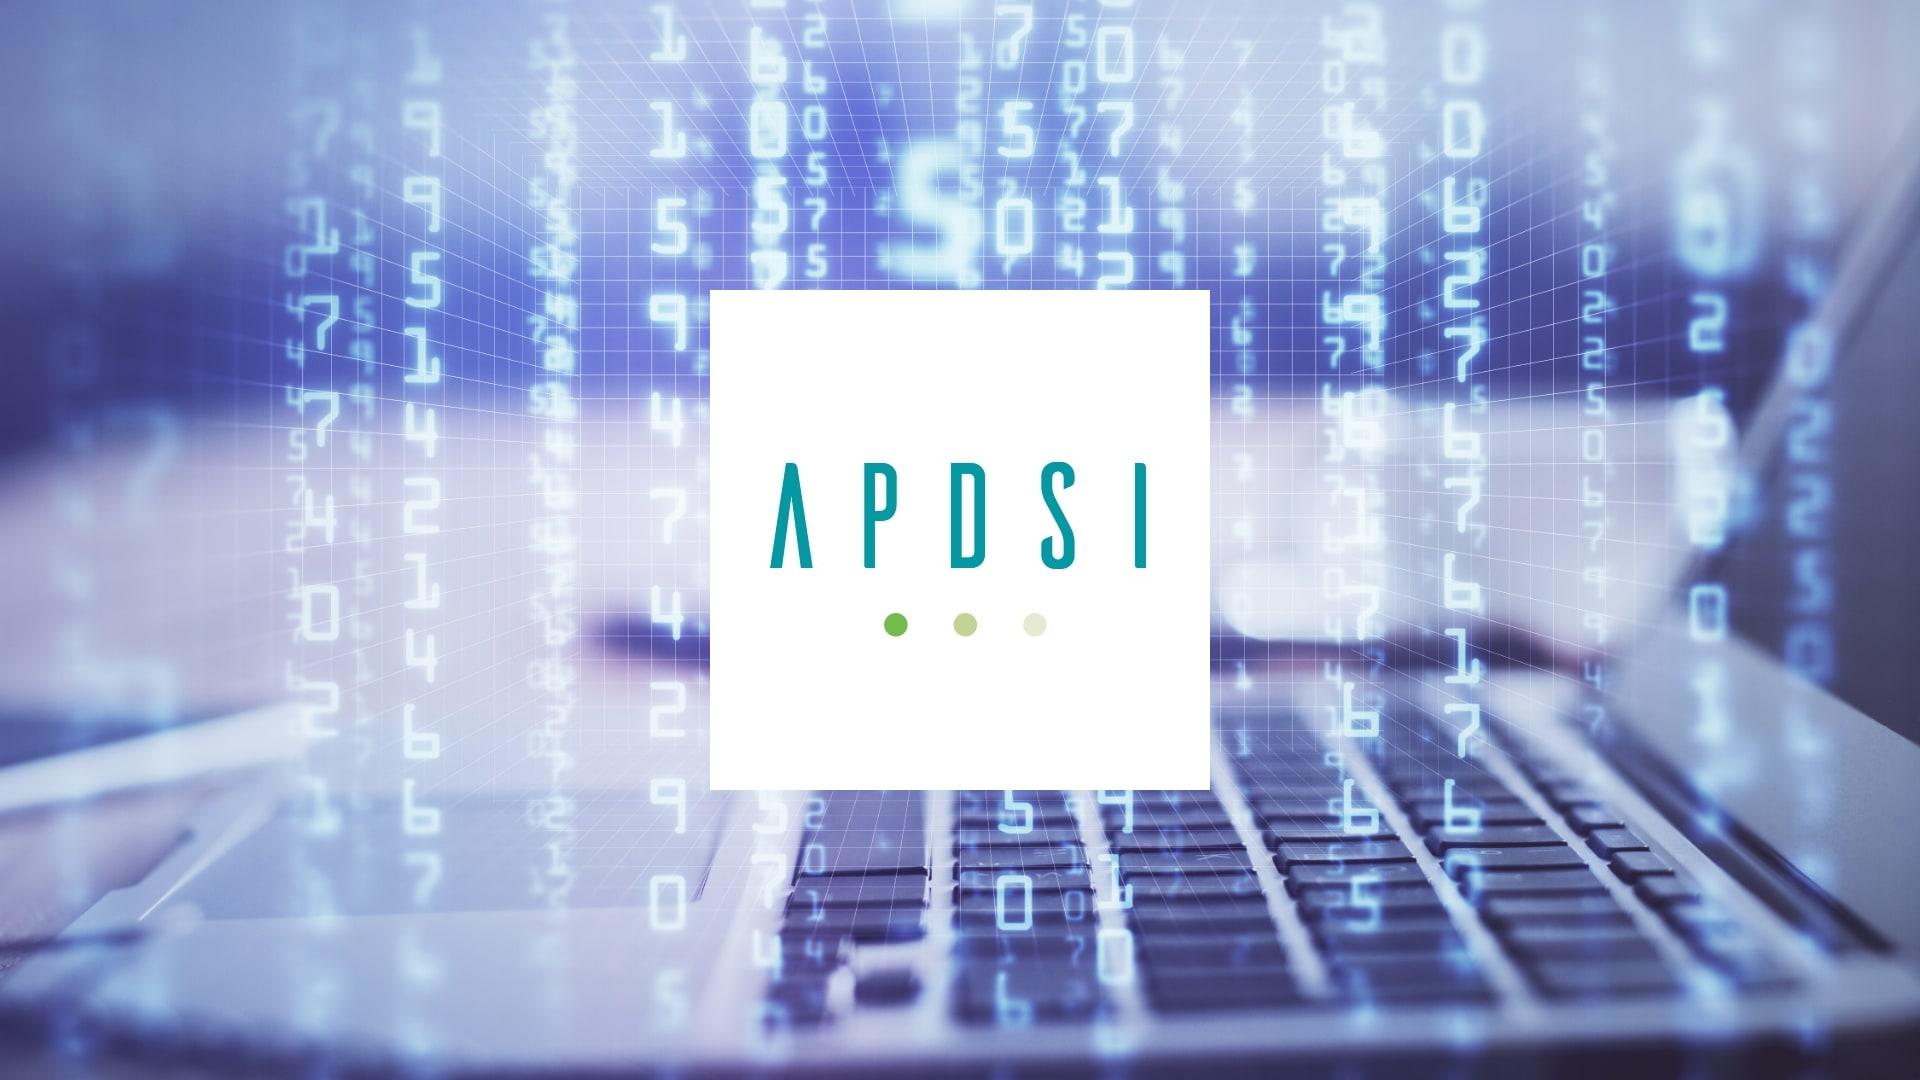 Piaget integra formalmente APDSI